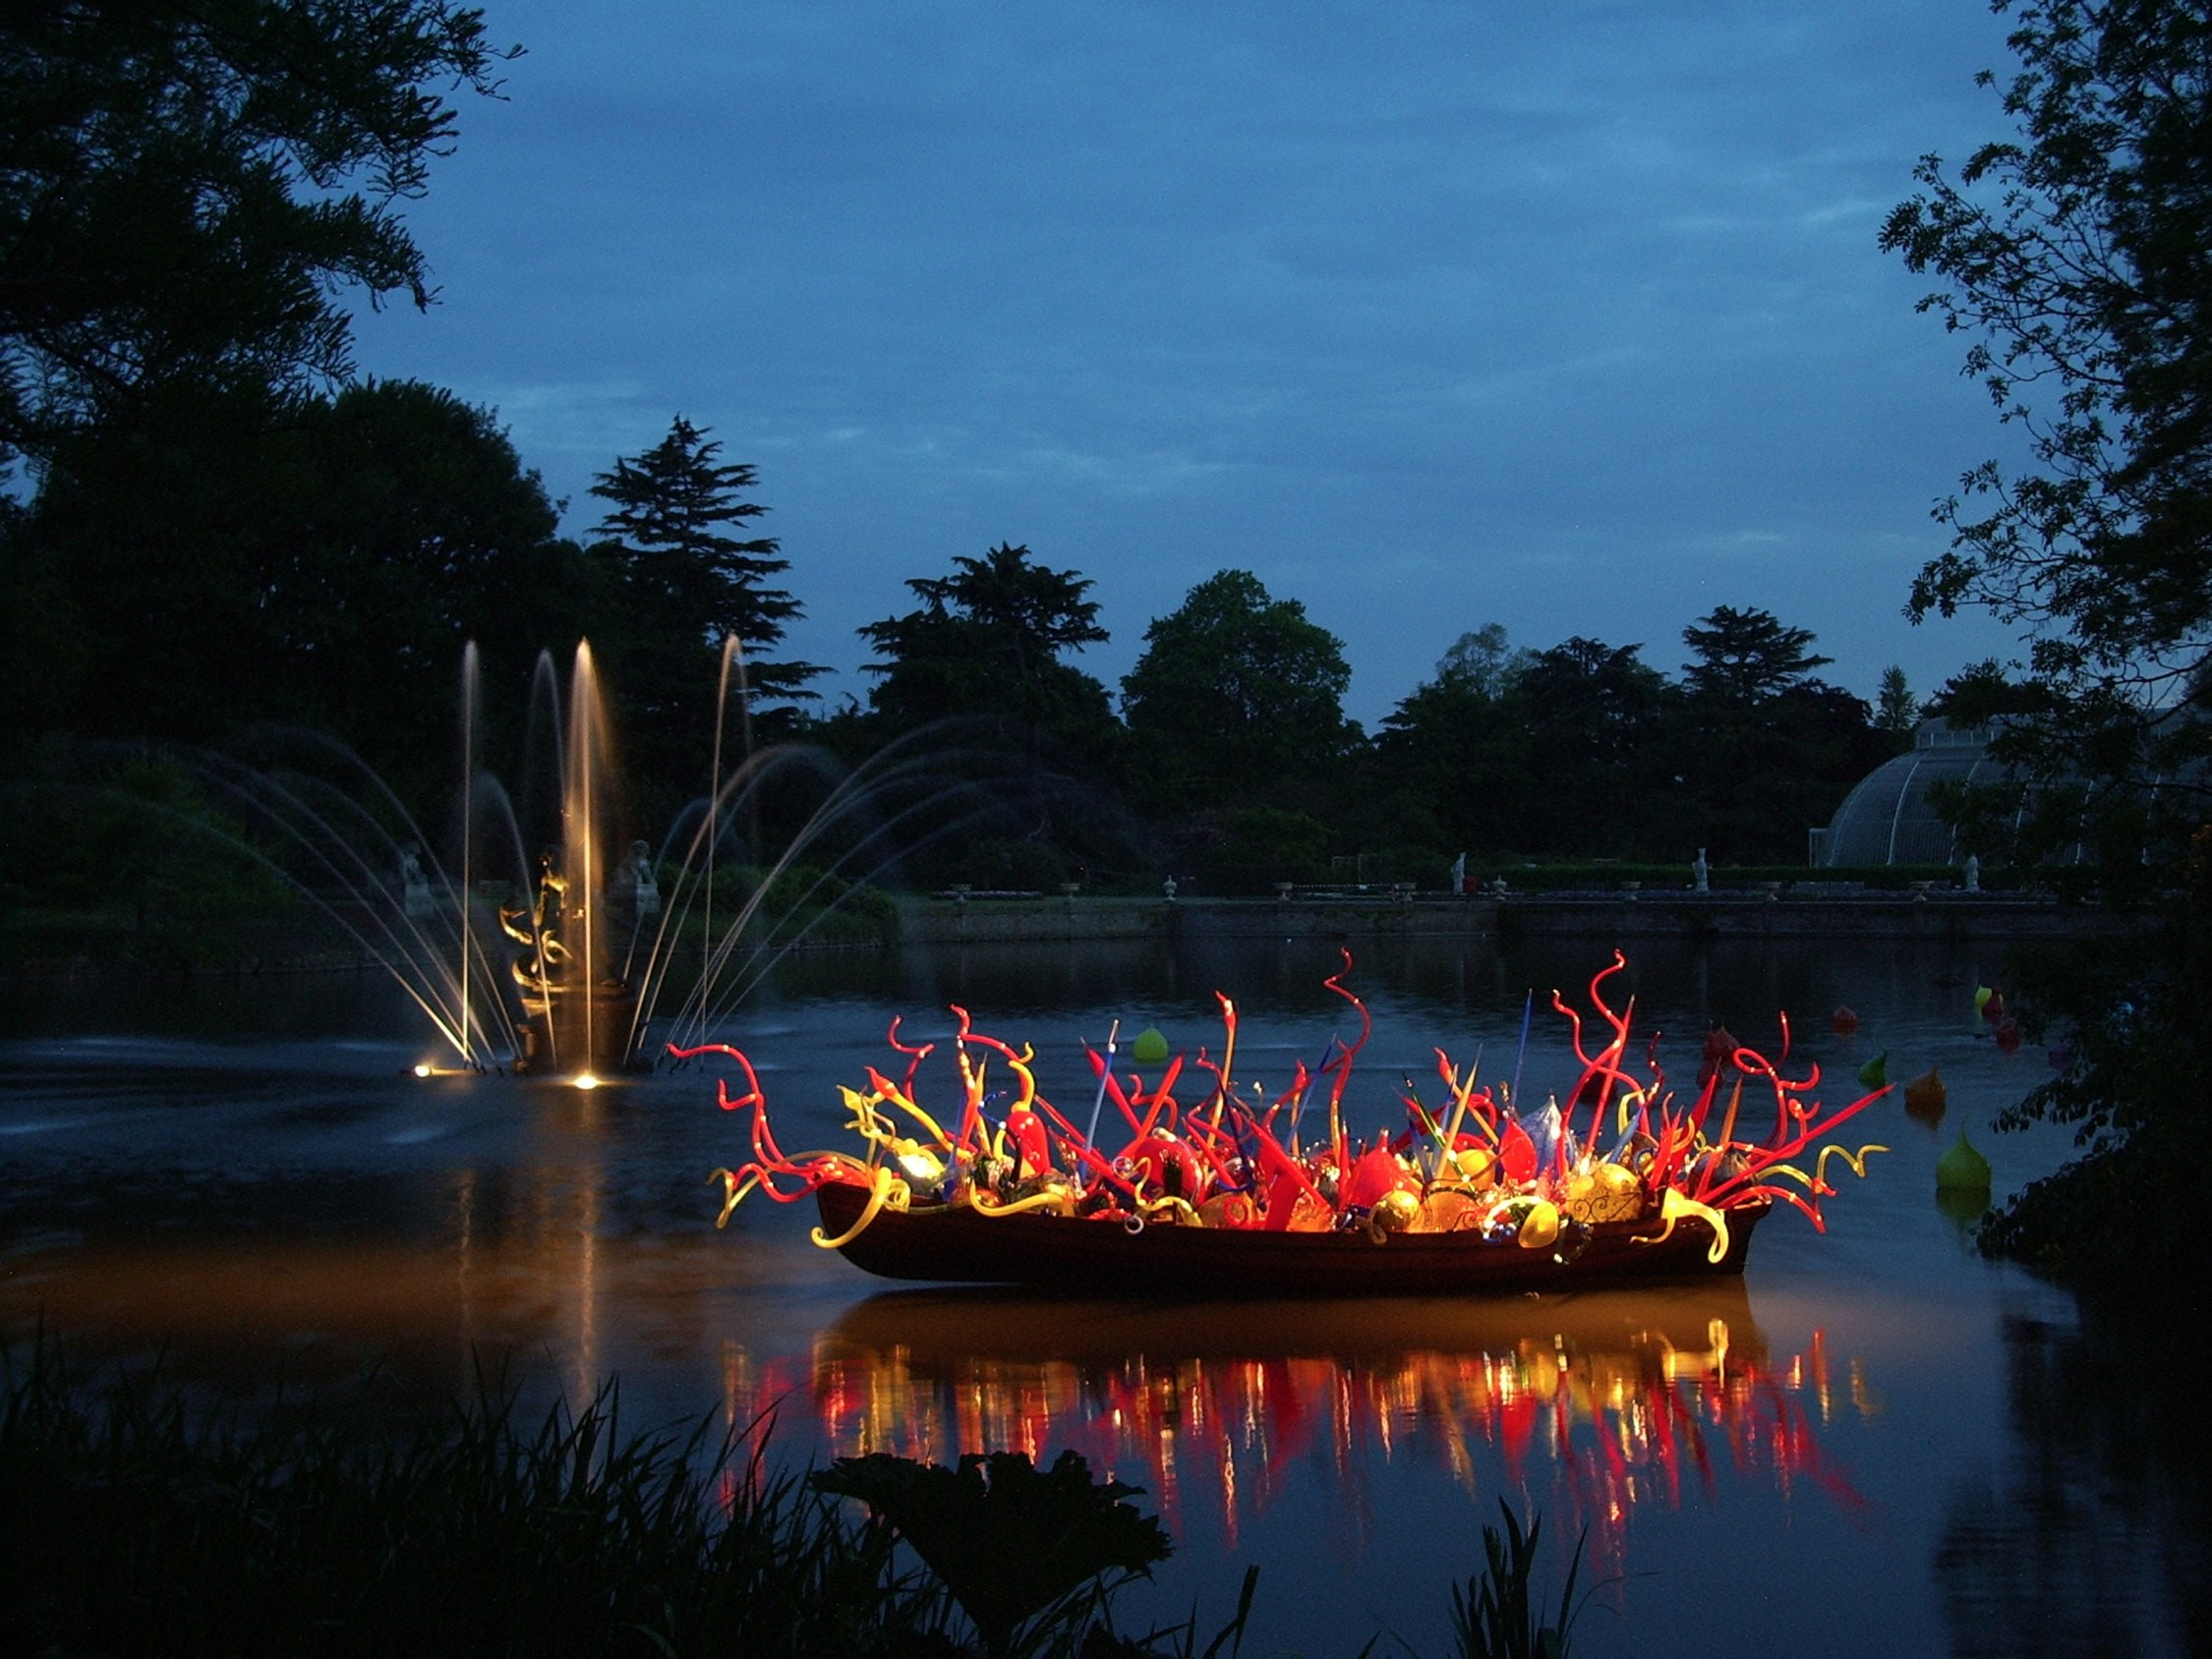 Royal-Botanical-Gardens-Studio-LUX-1